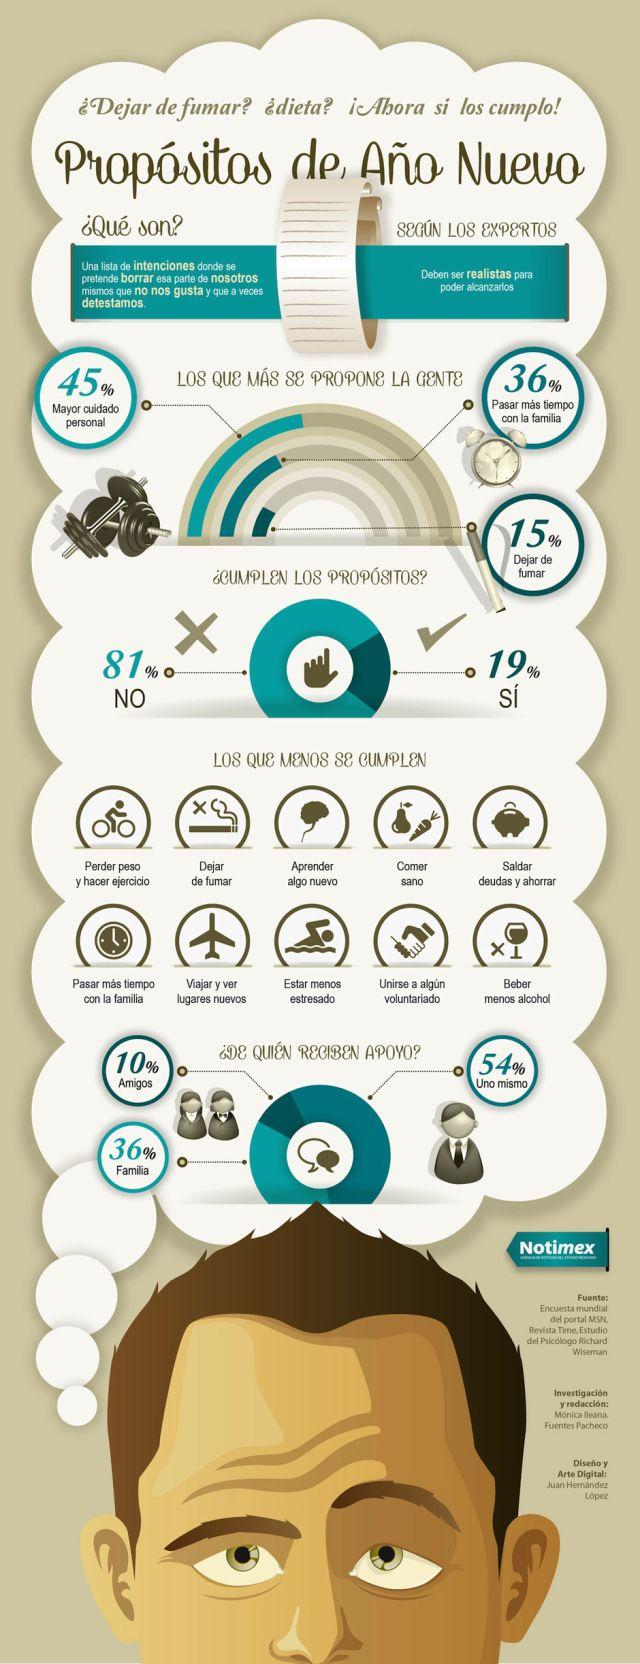 Propósitos de año nuevo #infografia #infographic #New Year's resolutions